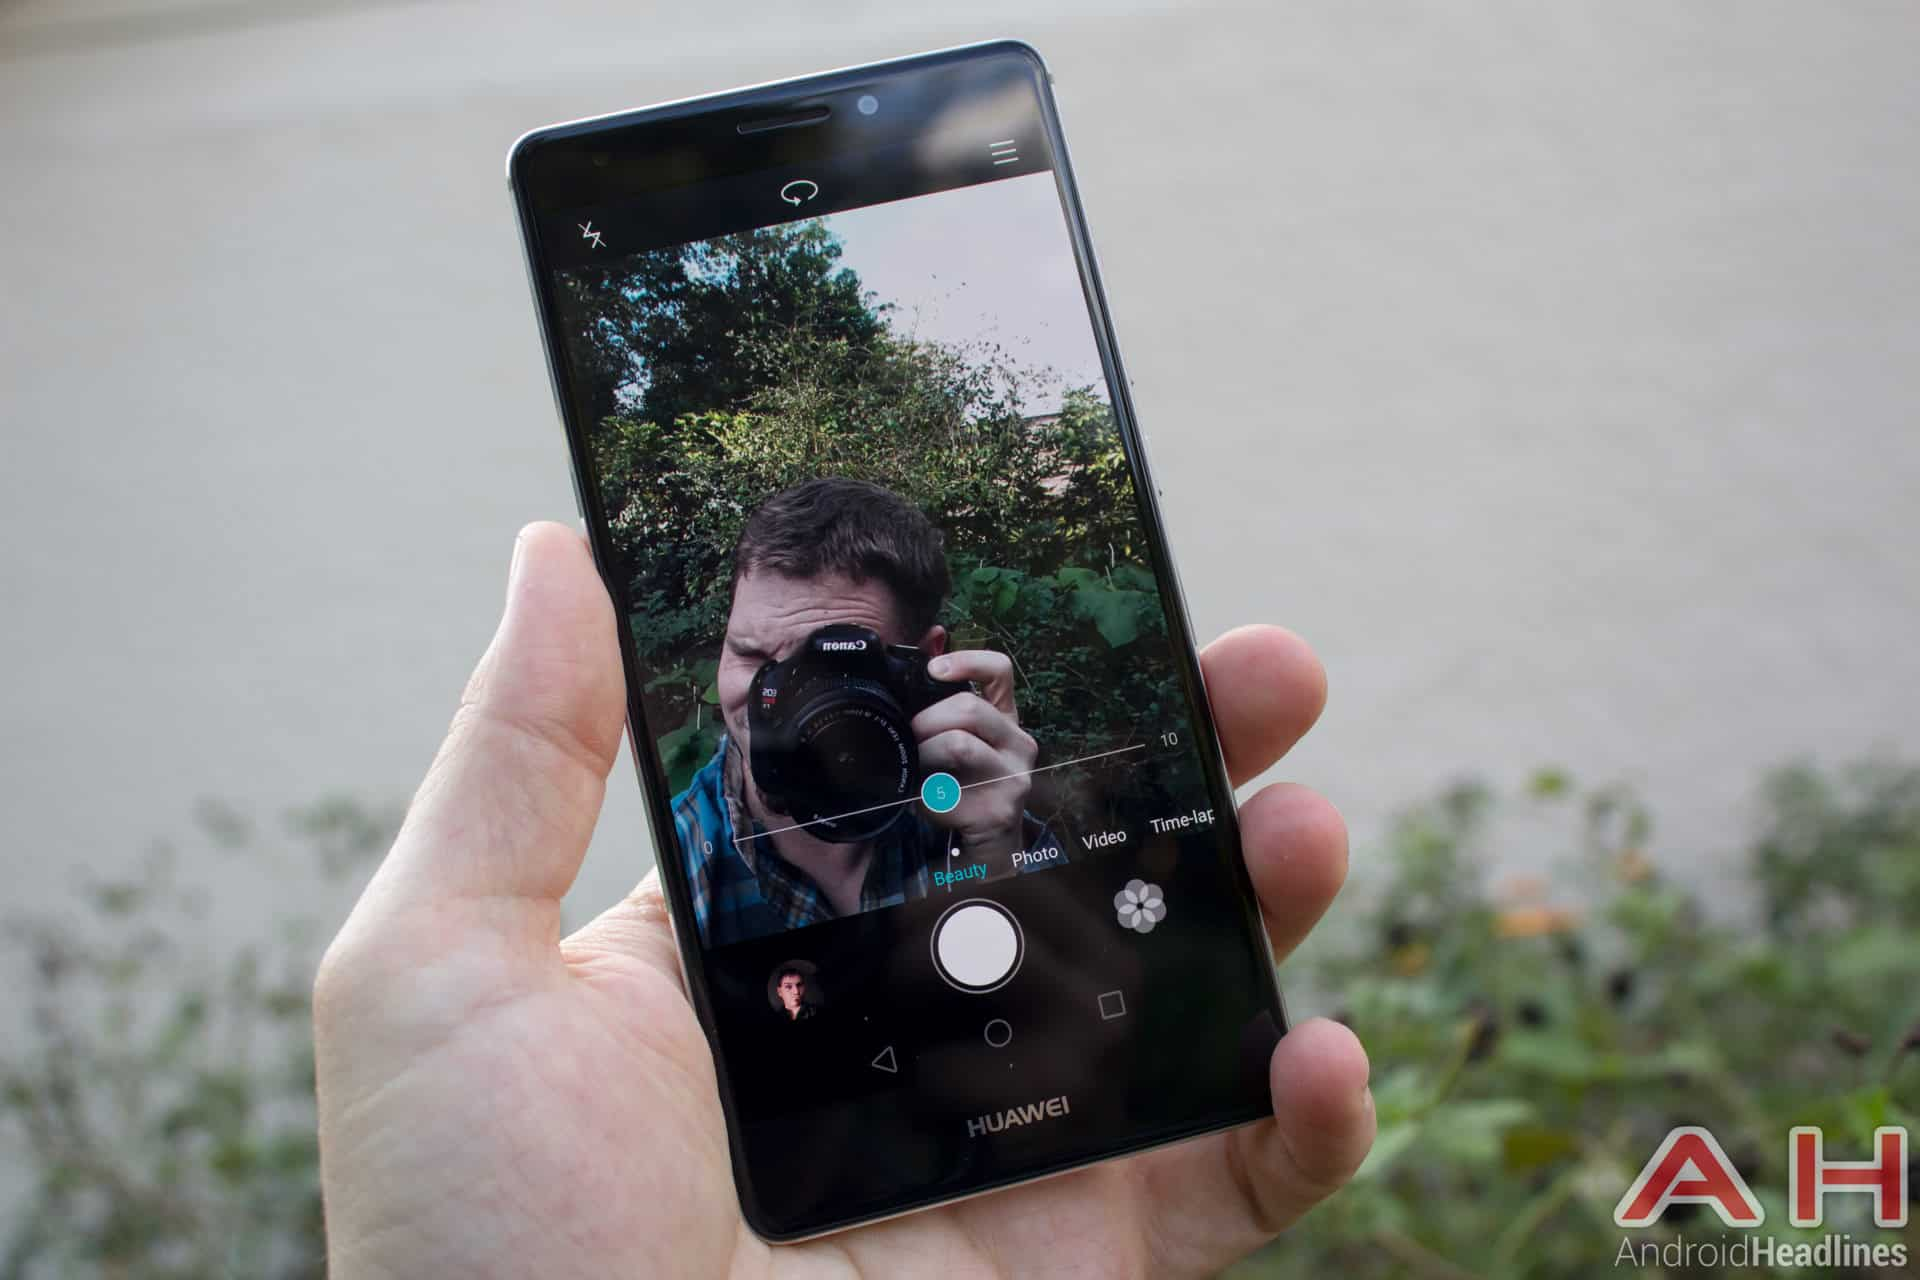 Huawei-Mate-S-AH-NS-camera